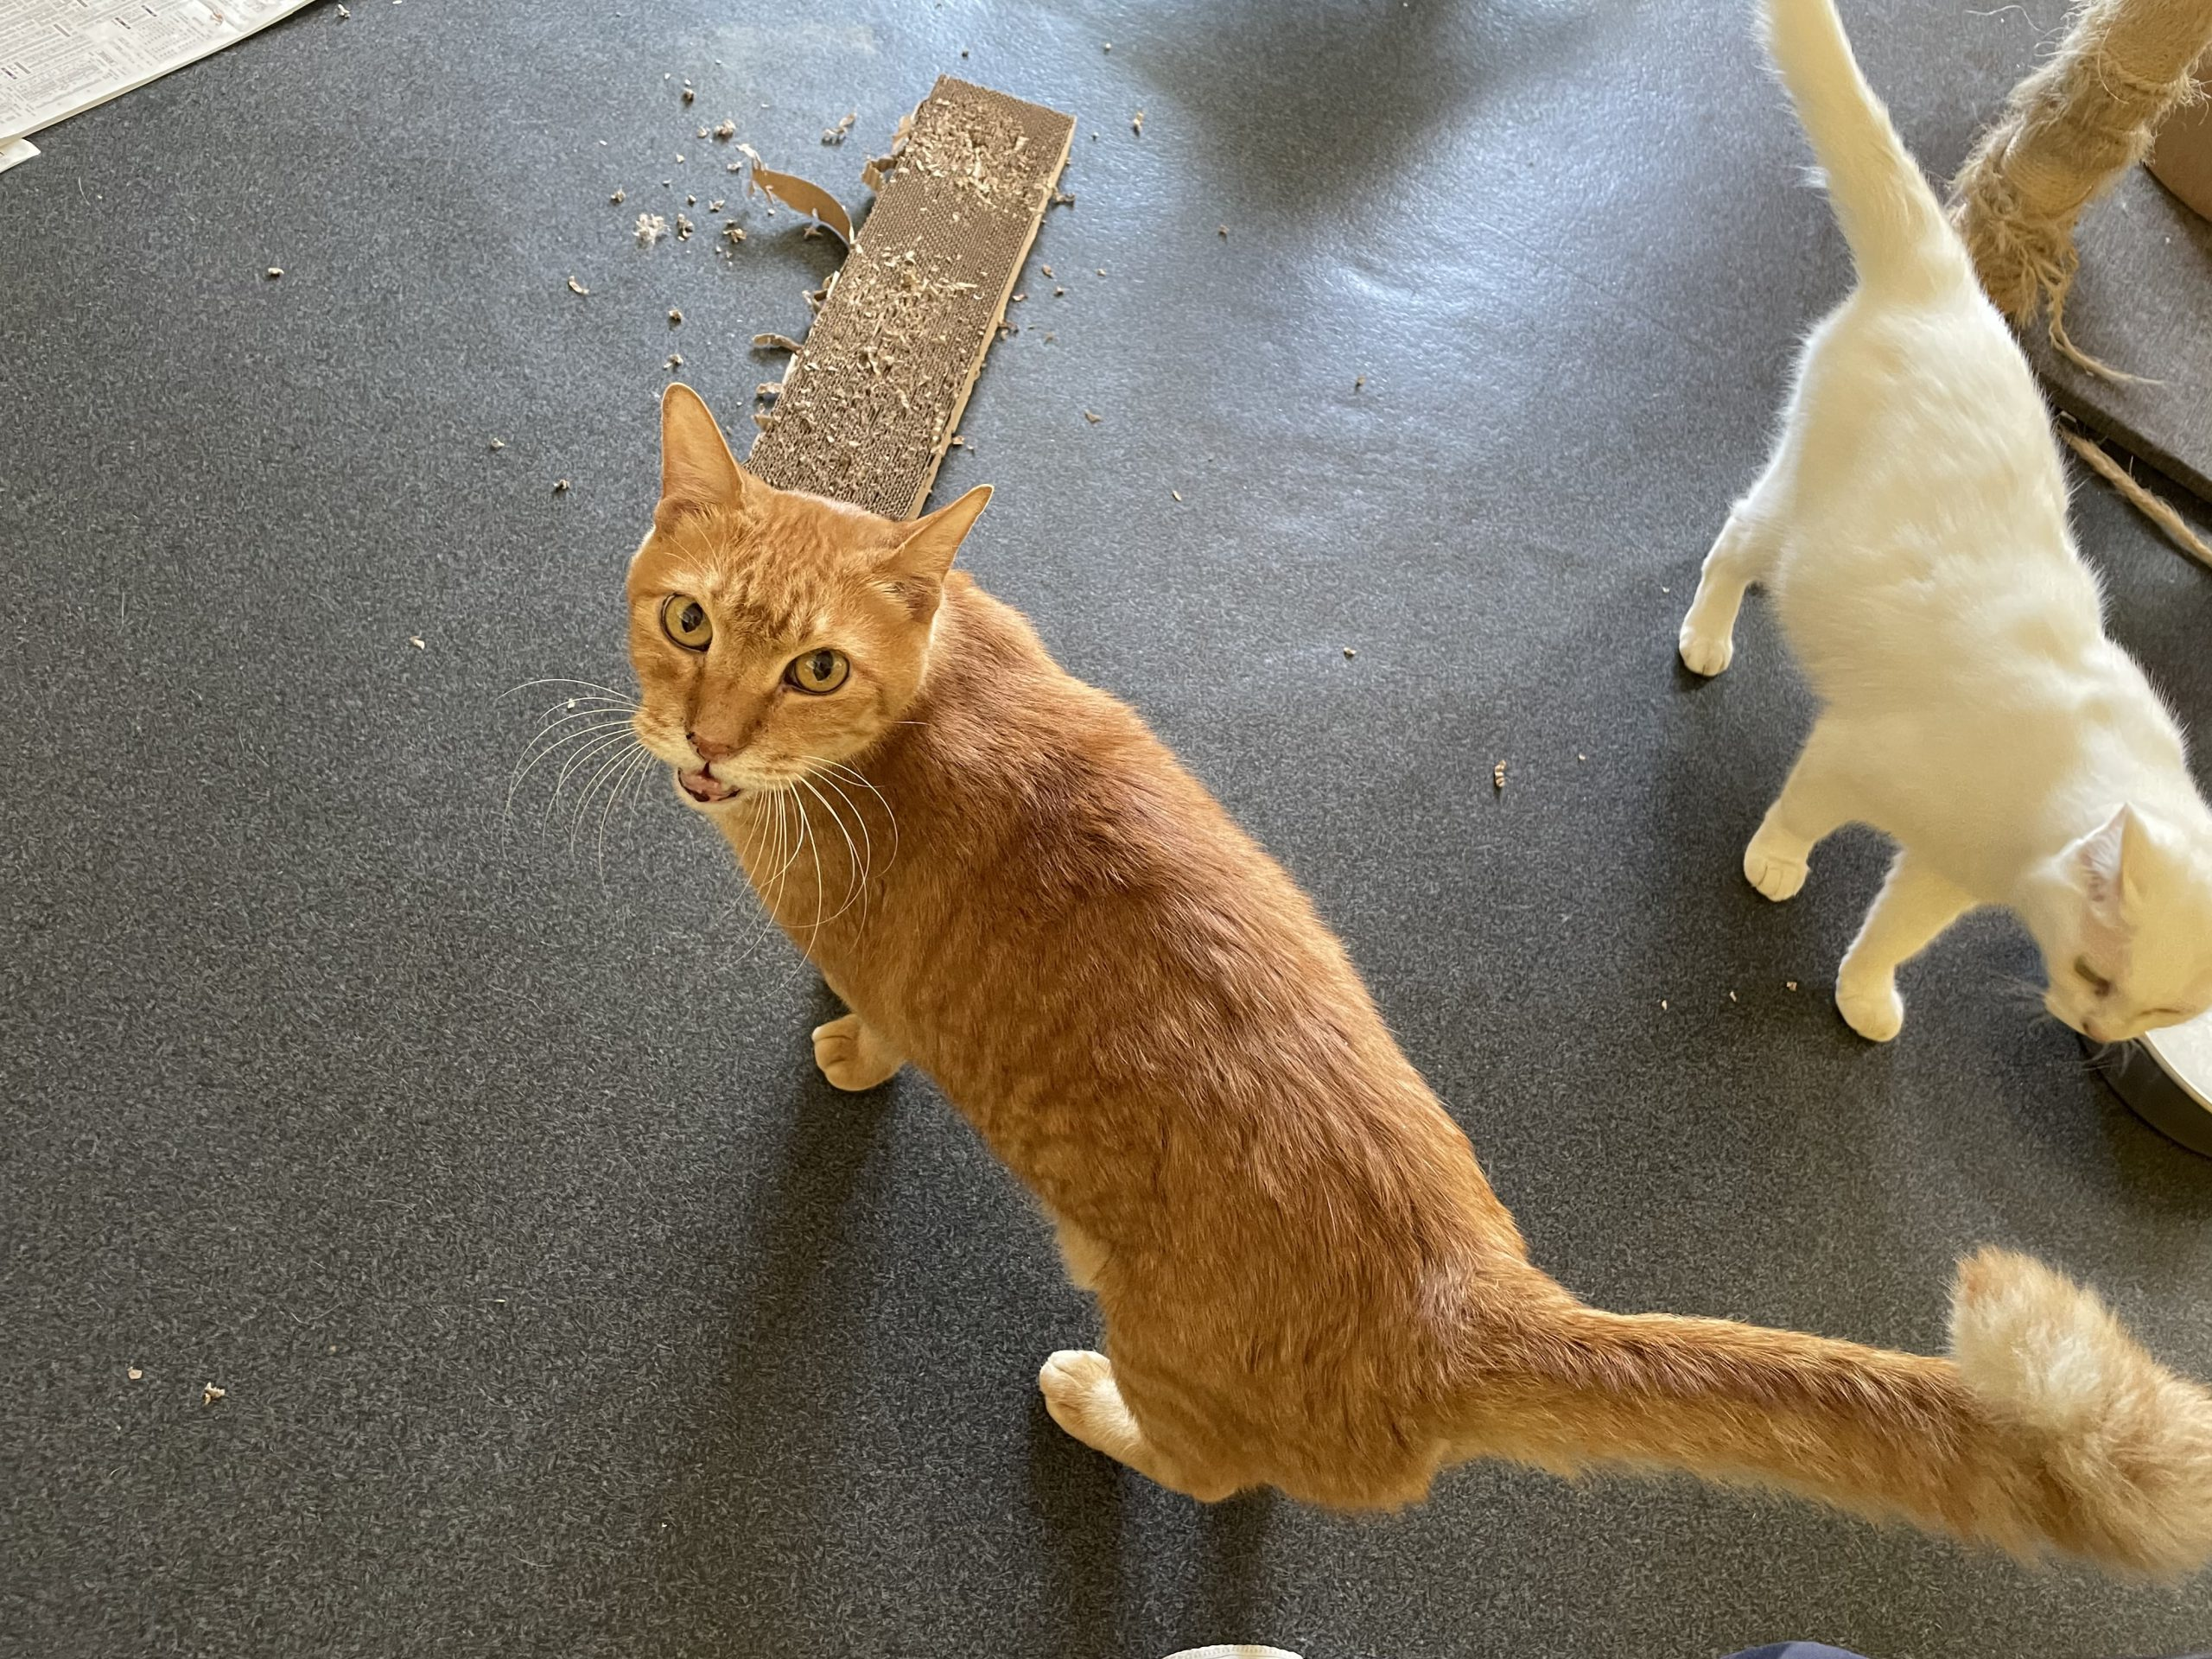 <ul> <li>猫種:日本猫 茶トラ</li> <li>性別:不明</li> <li>名前:トント</li> <li>年齢:不明</li> <li>保護経緯:飼い主様が亡くなられたため飼育困難になり保護しました。</li> </ul>